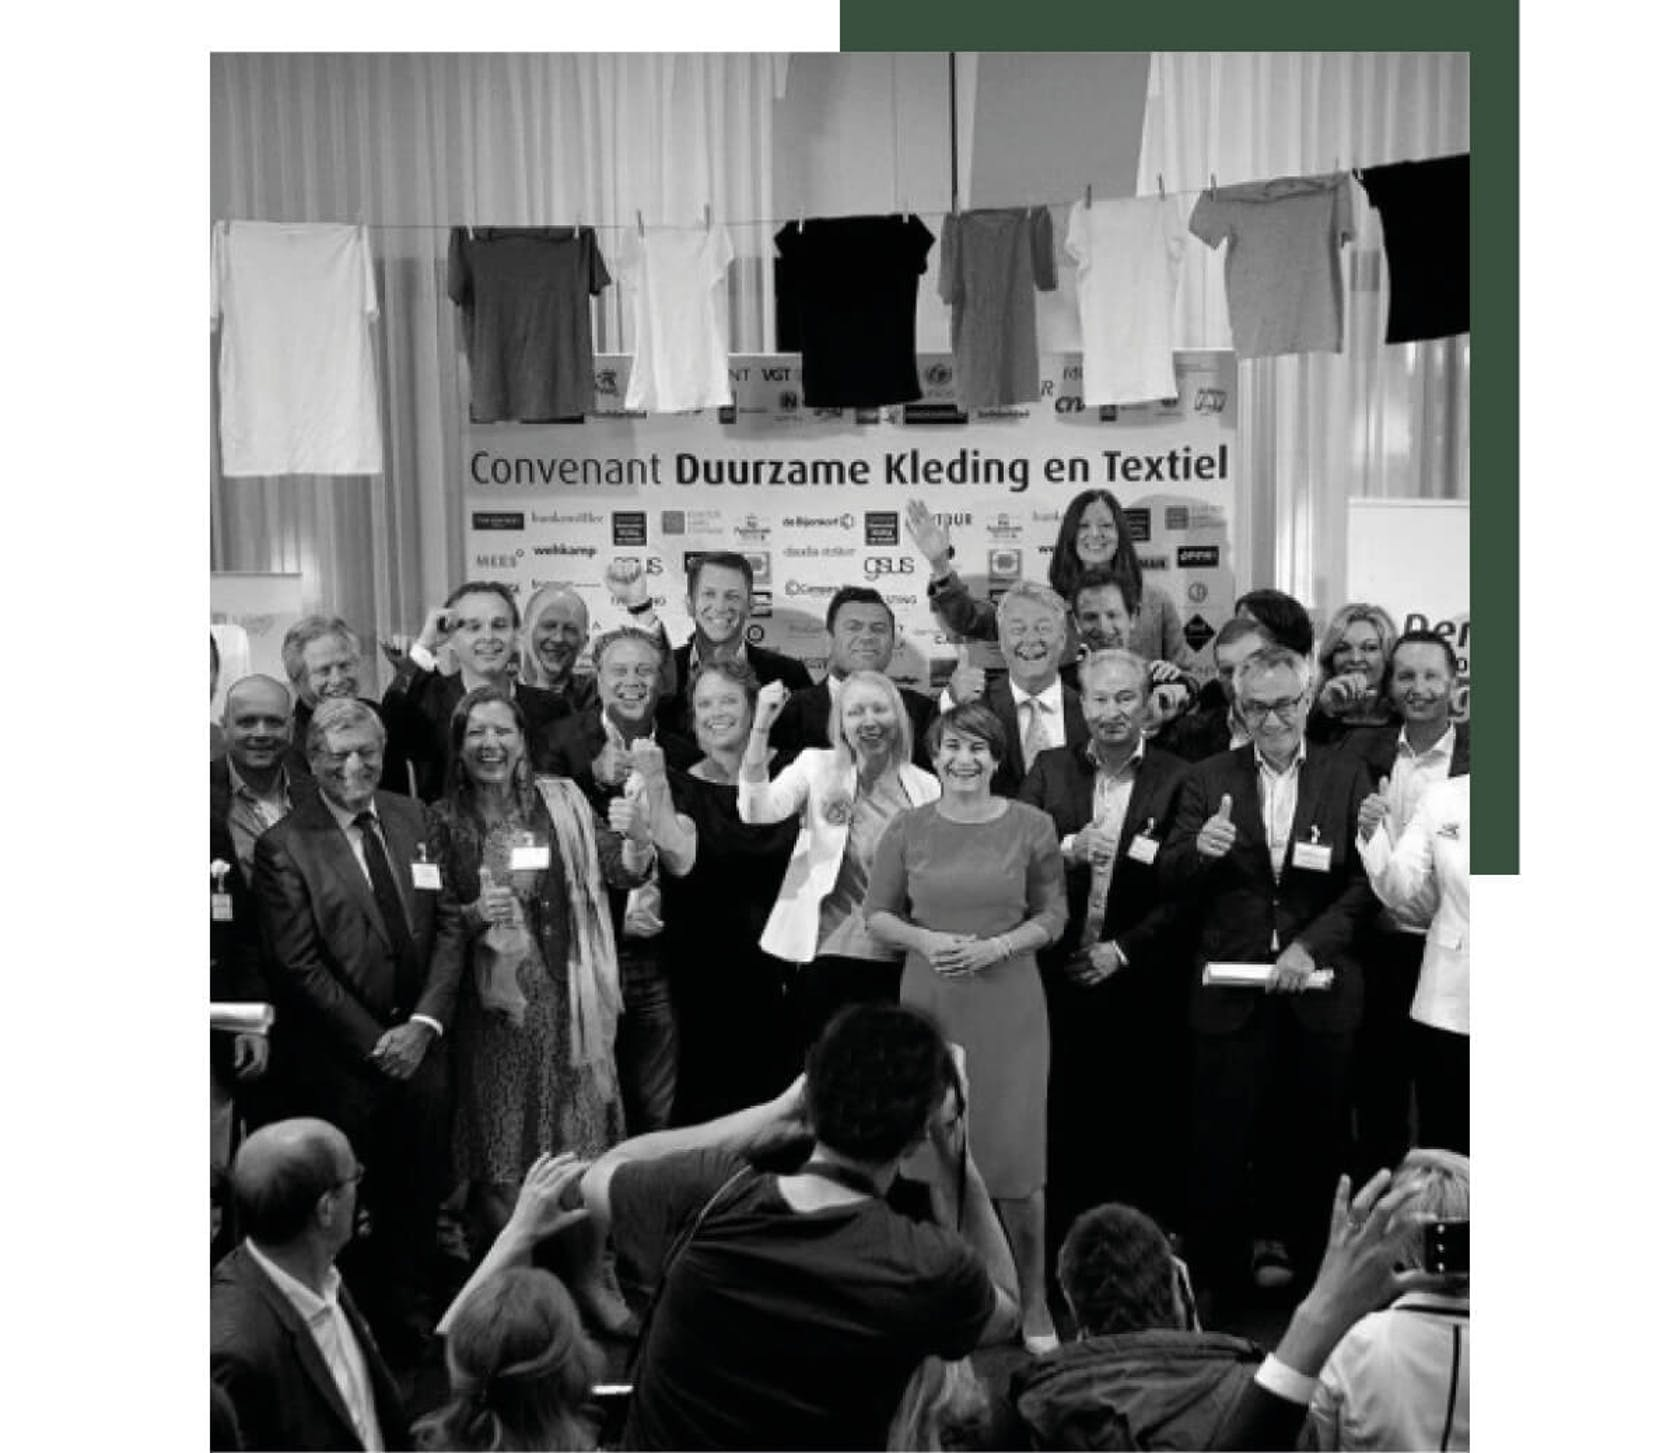 ESSENZA HOME ondertekent Convenant Duurzame Kleding en Textiel